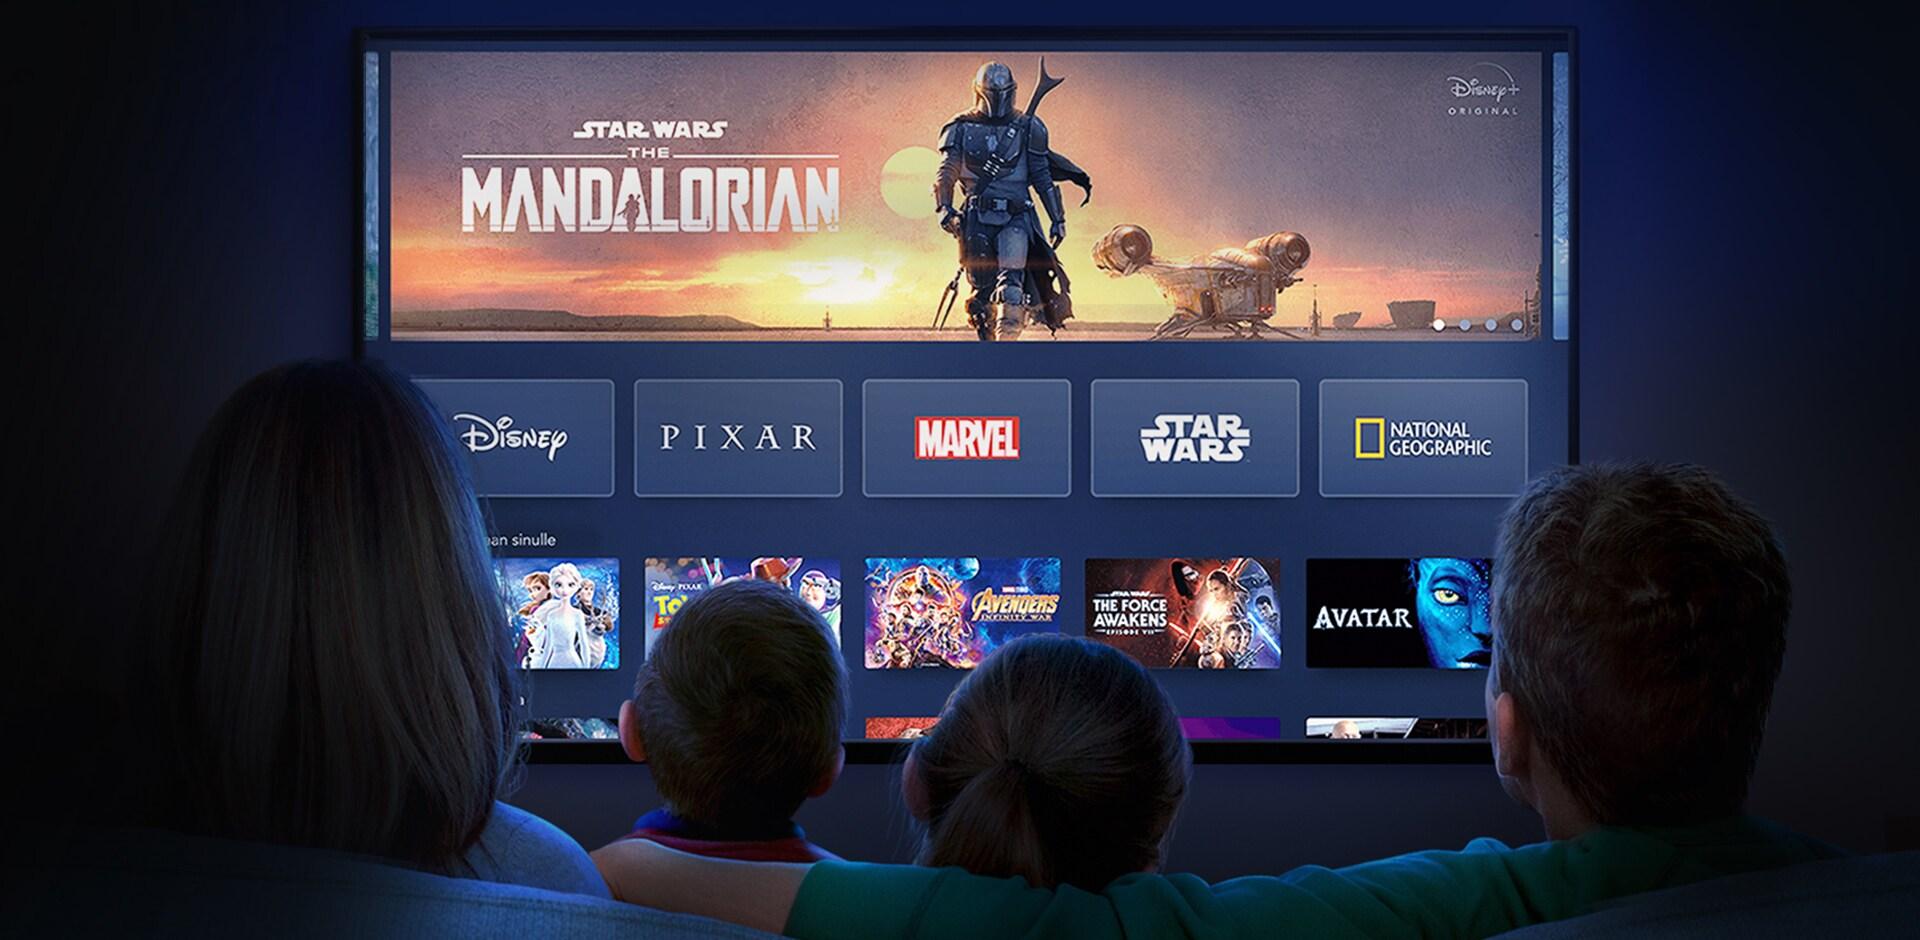 Perhe istuu sohvalla katsomassa Disney+ -palvelua televisioruudulta.